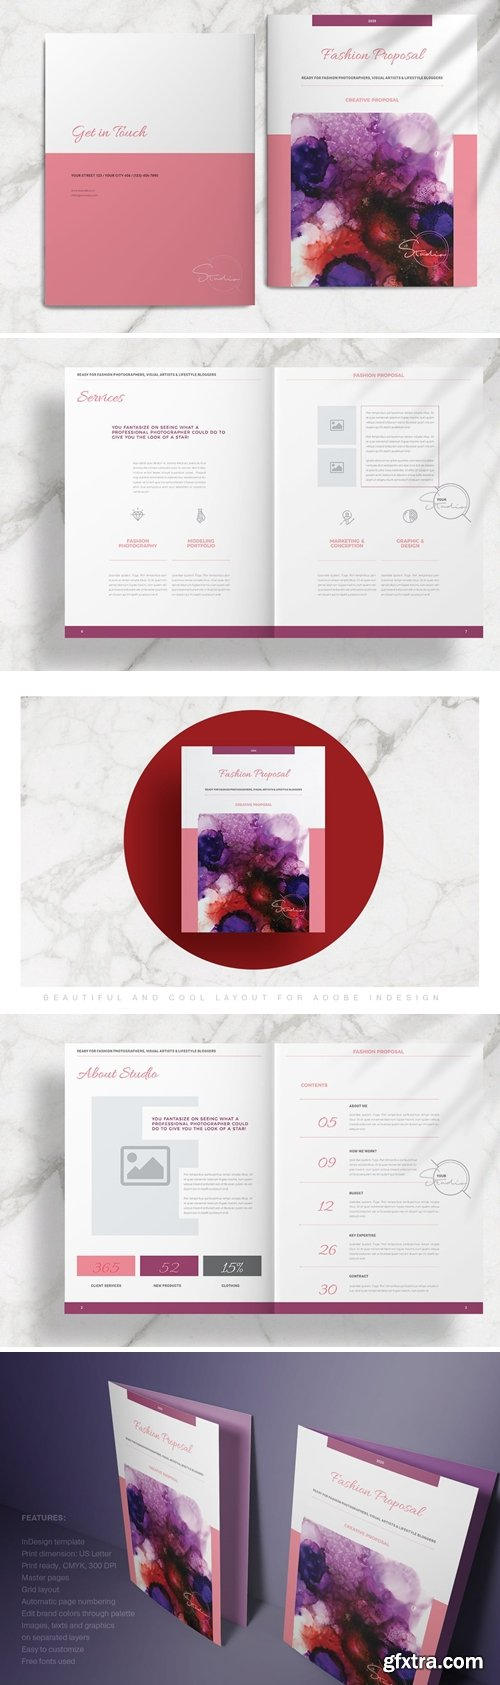 CM - Pink Fashion Proposal Layout 4340135